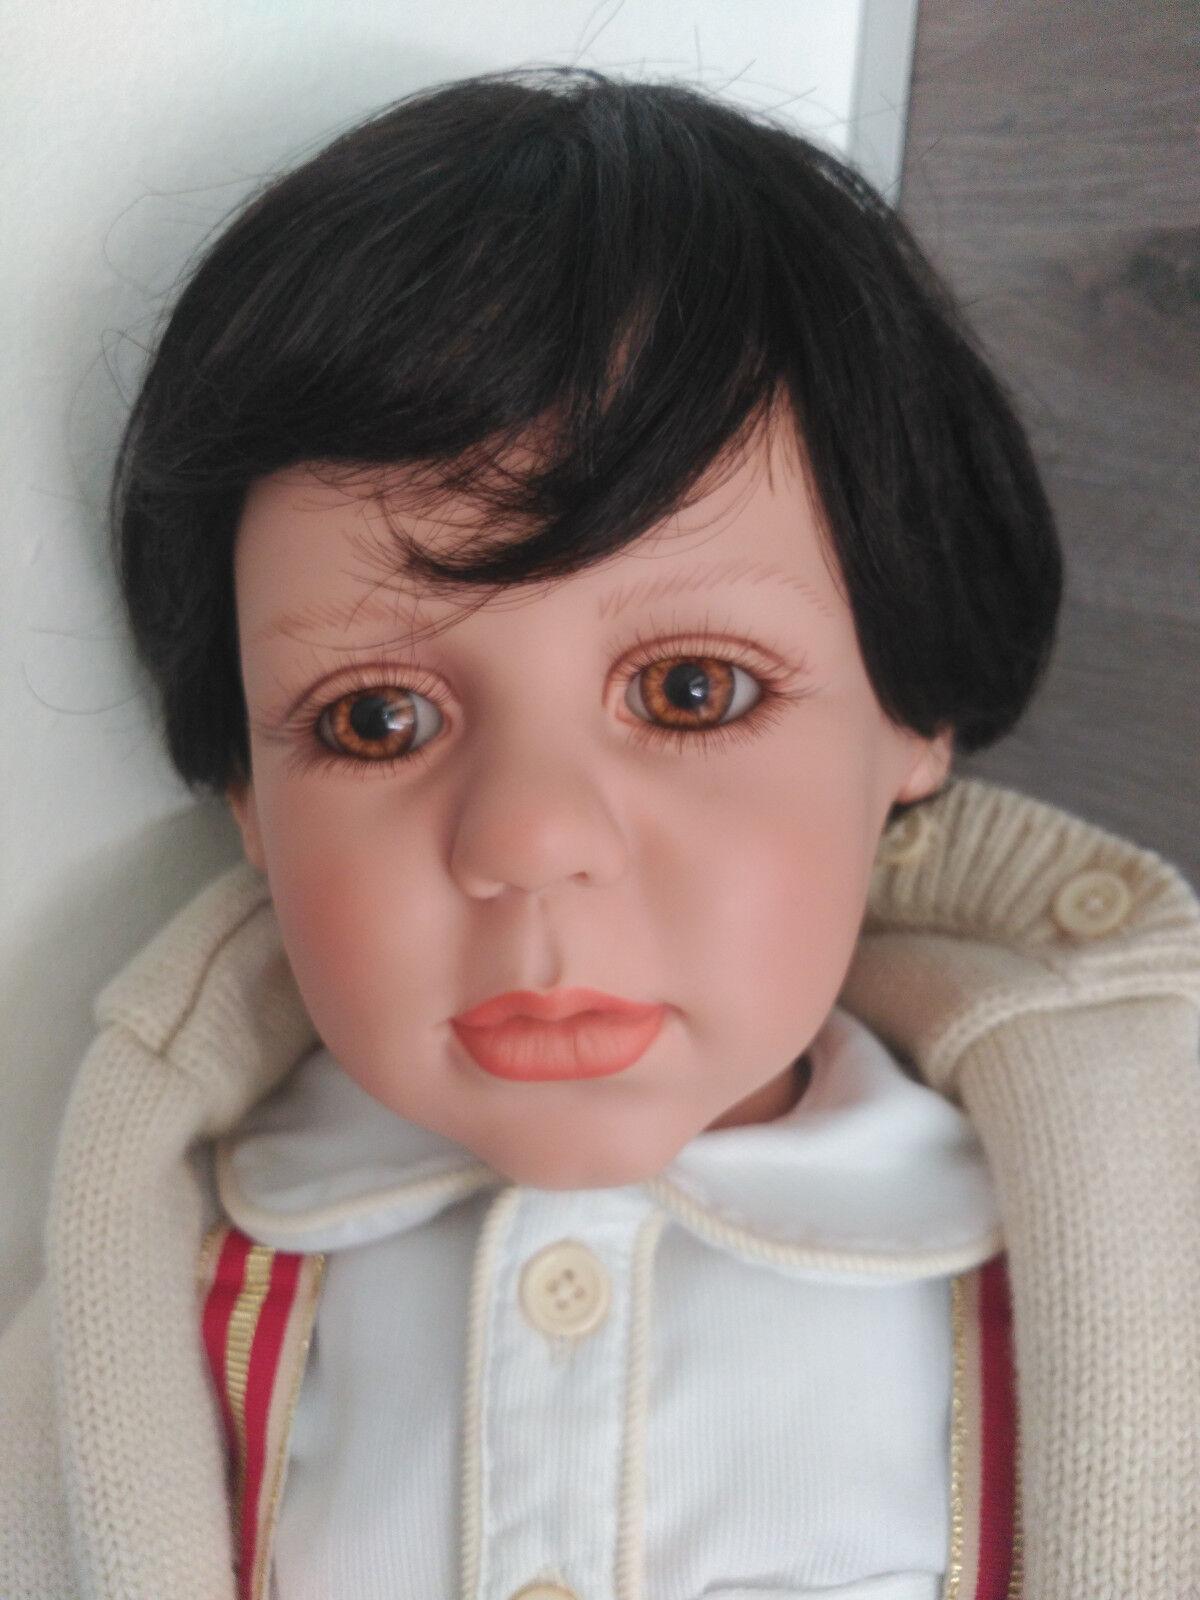 Muñeco maniquí maniquí maniquí realista toddler MasterPiece vinyl 78cms by Fayzah Spanos.  preferente